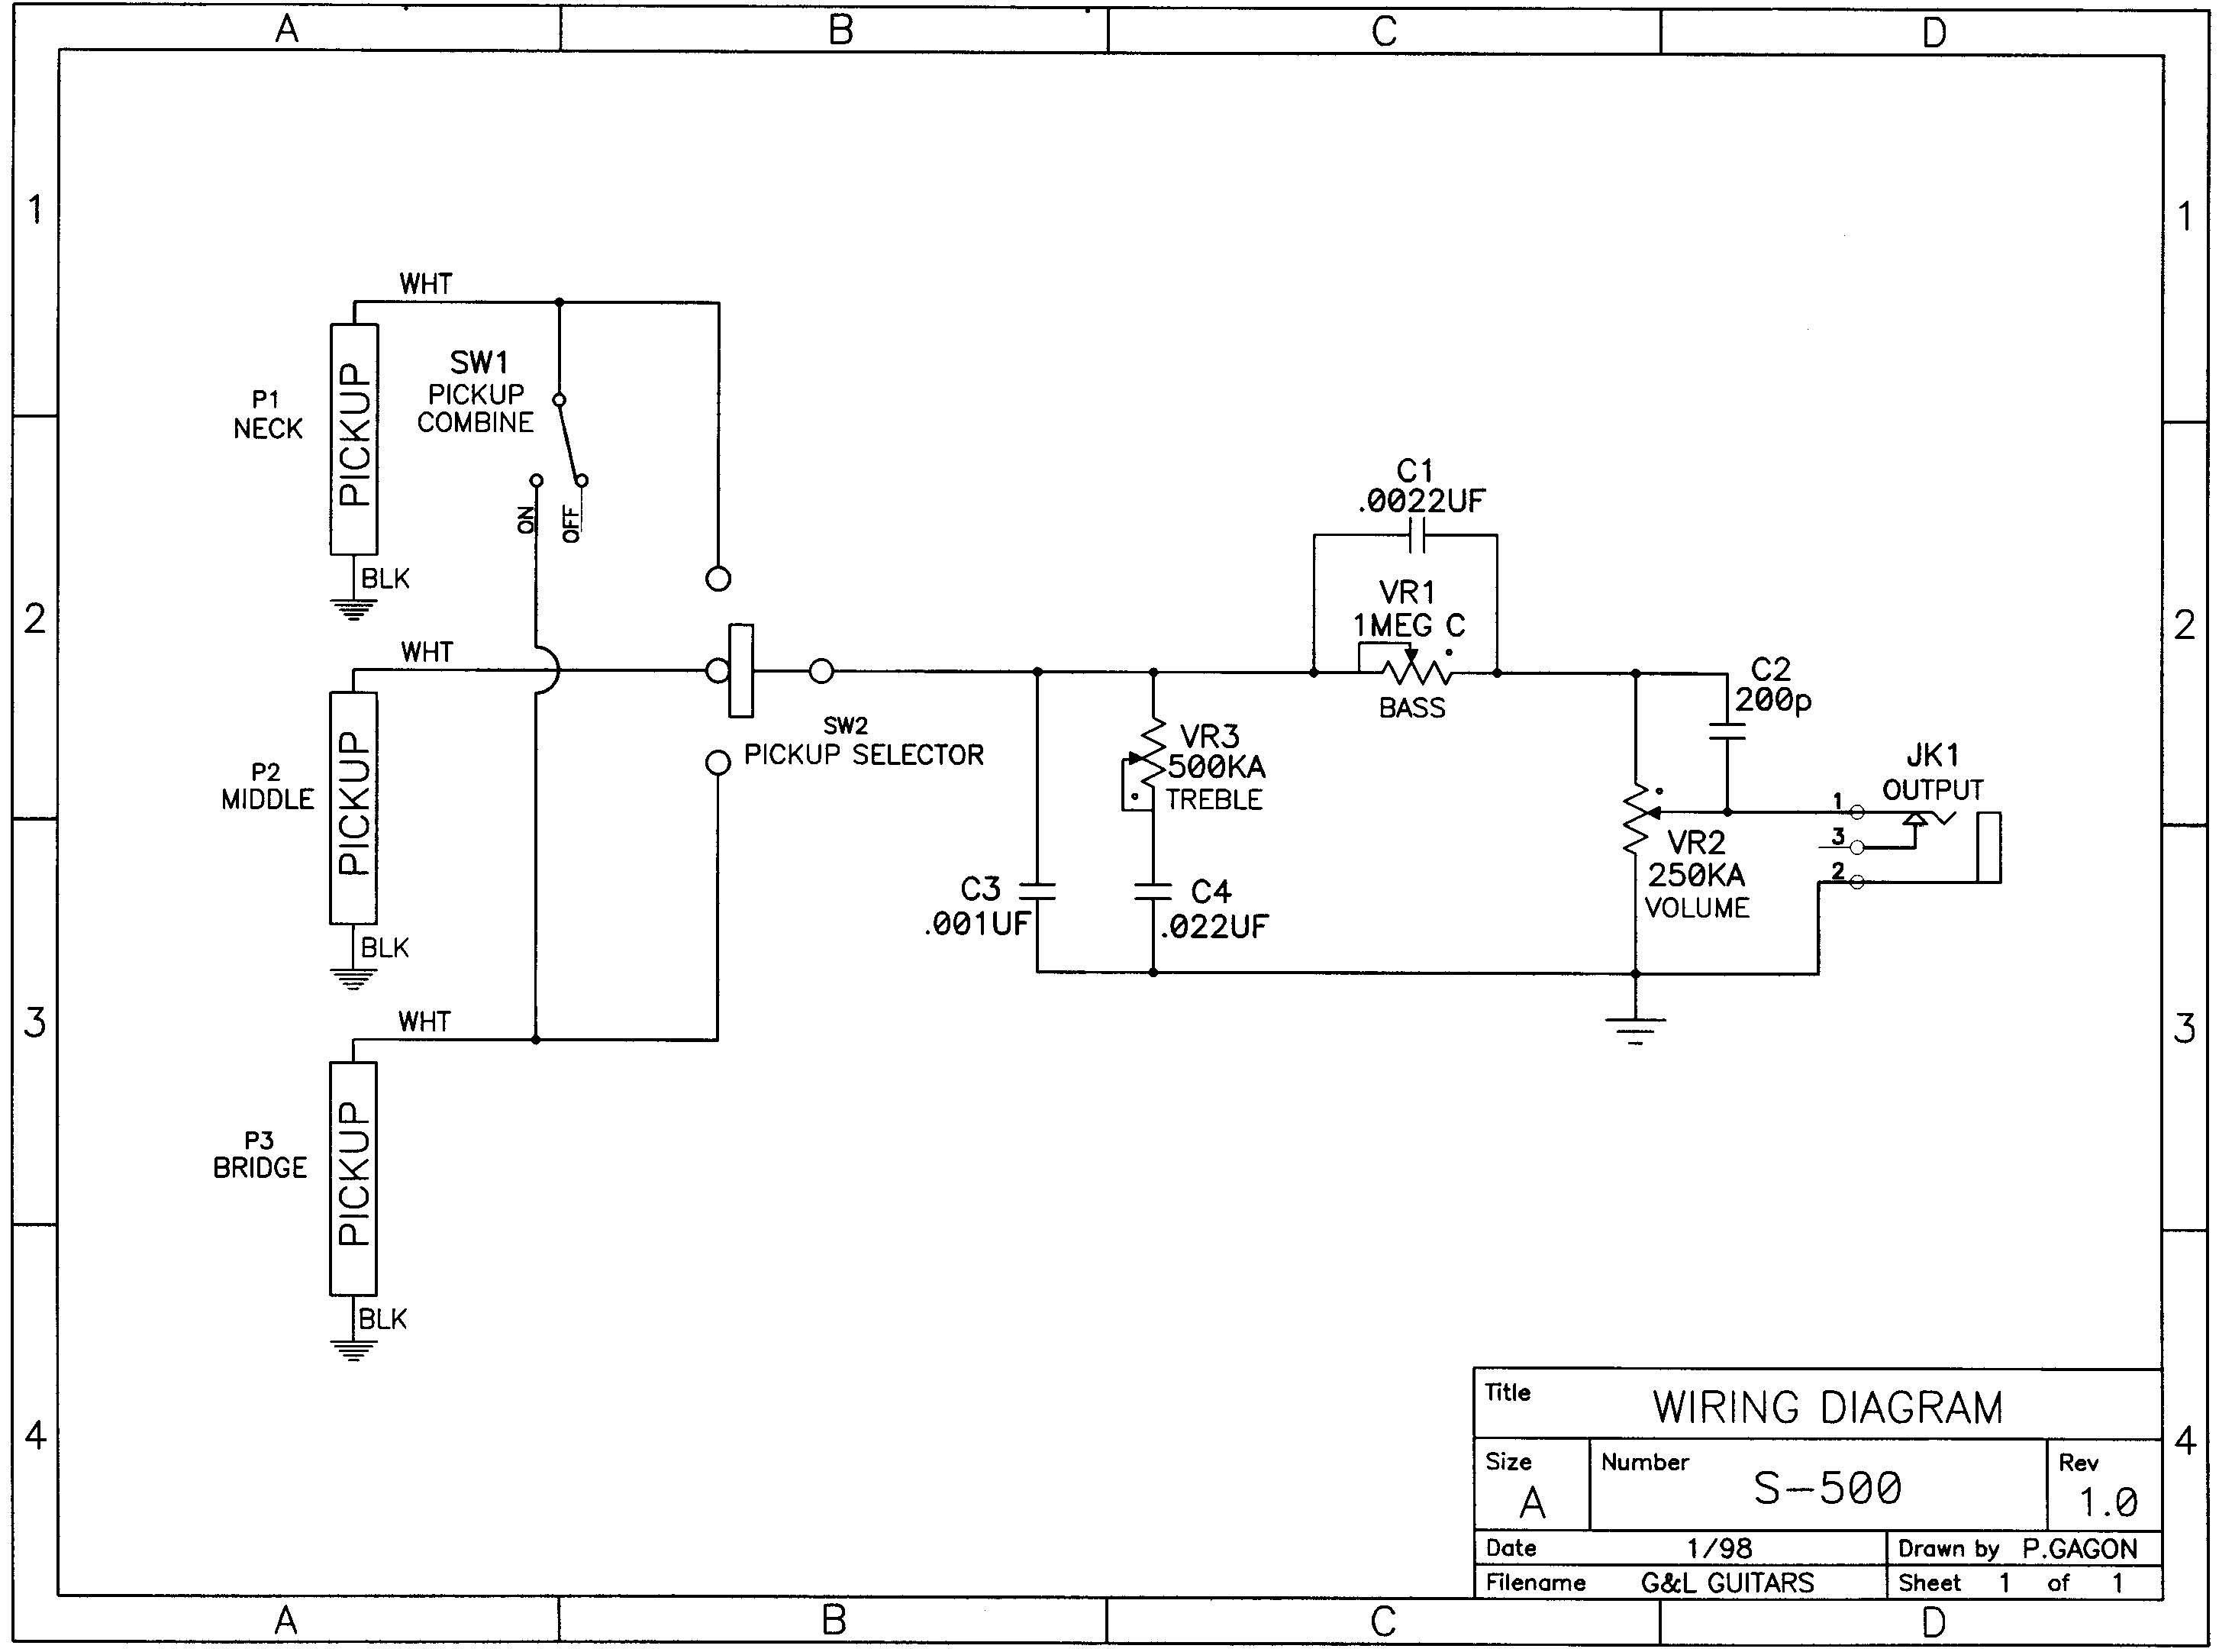 John Deere Mower Deck Belt Diagram 131 X 160 Gif 8kb Lt166 Wiring Guitar Speaker Cabi On Ibanez Series Rh Abetter Pw